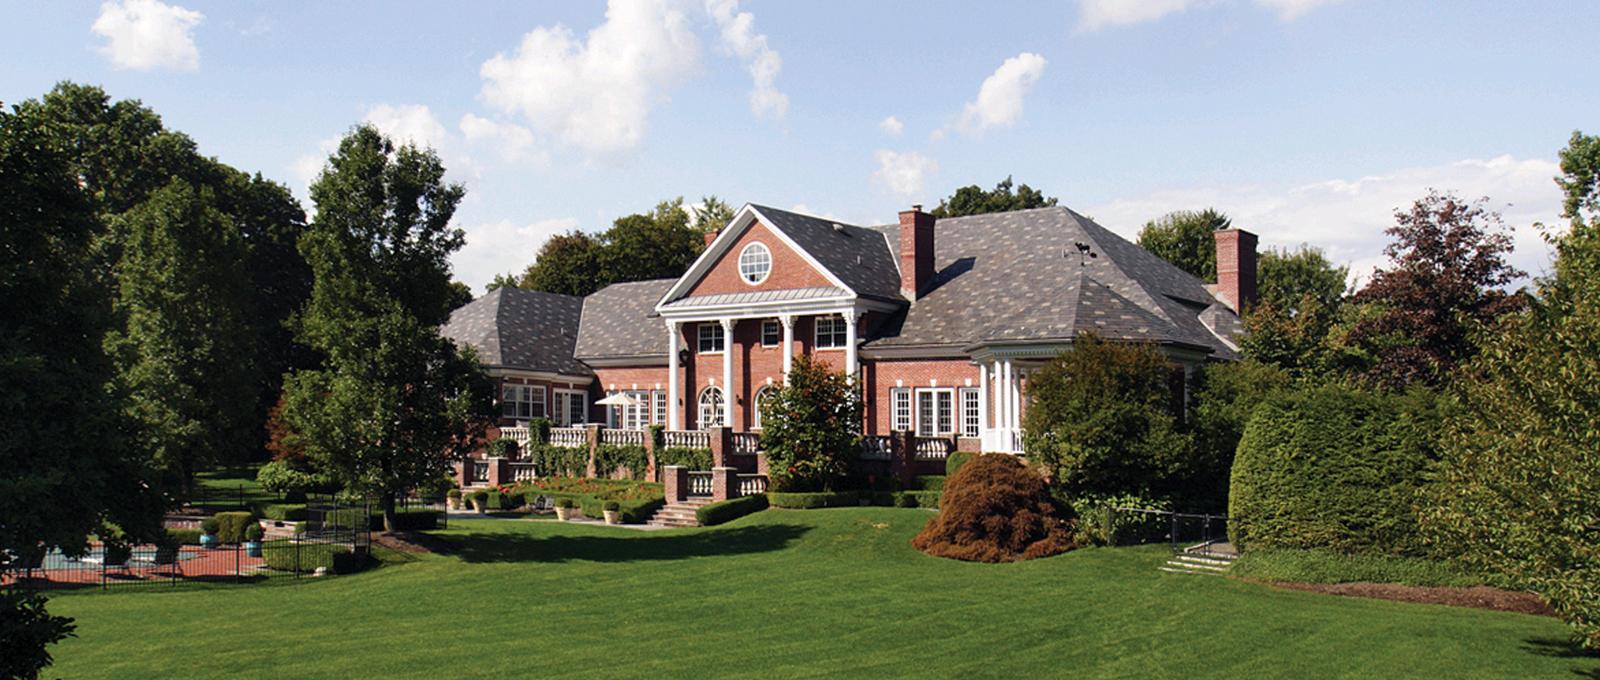 Casa para uma família para Venda às Fabulous 5 Acre Estate 2 Lincoln Lane Purchase, Nova York 10577 Estados Unidos